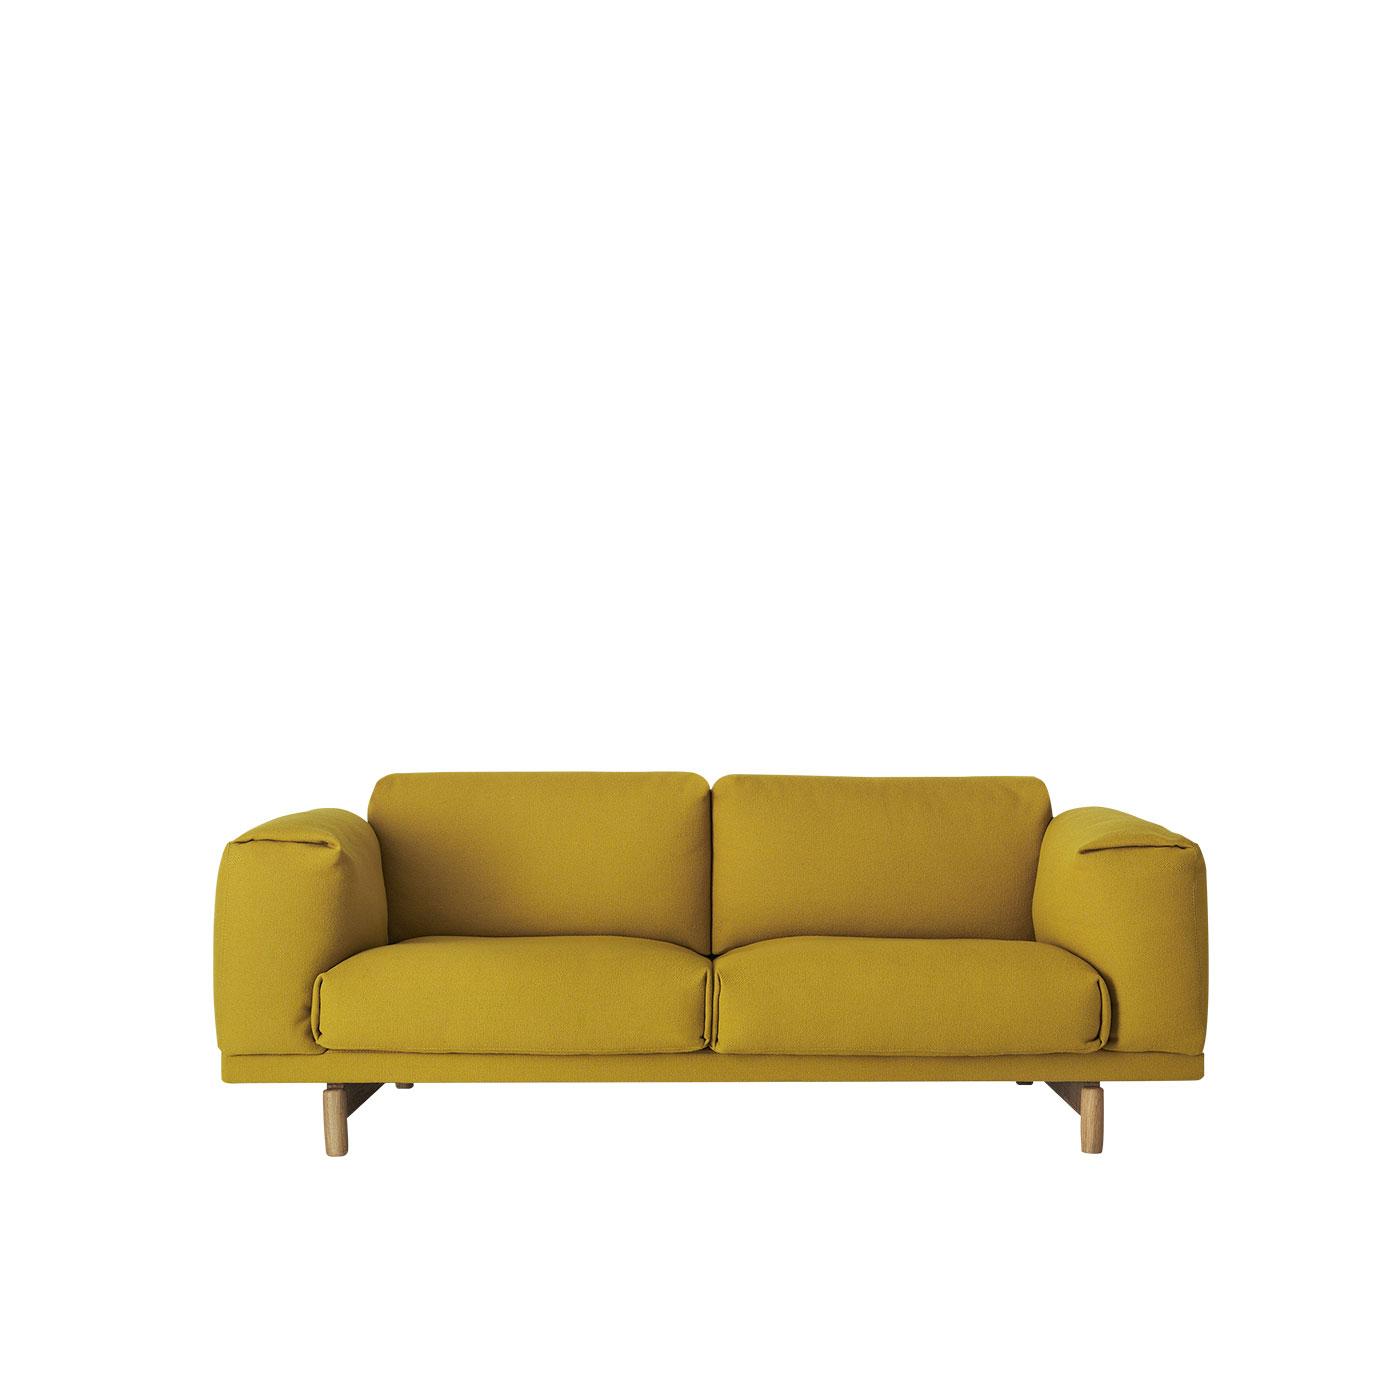 zweisitzer sofa grau. Black Bedroom Furniture Sets. Home Design Ideas